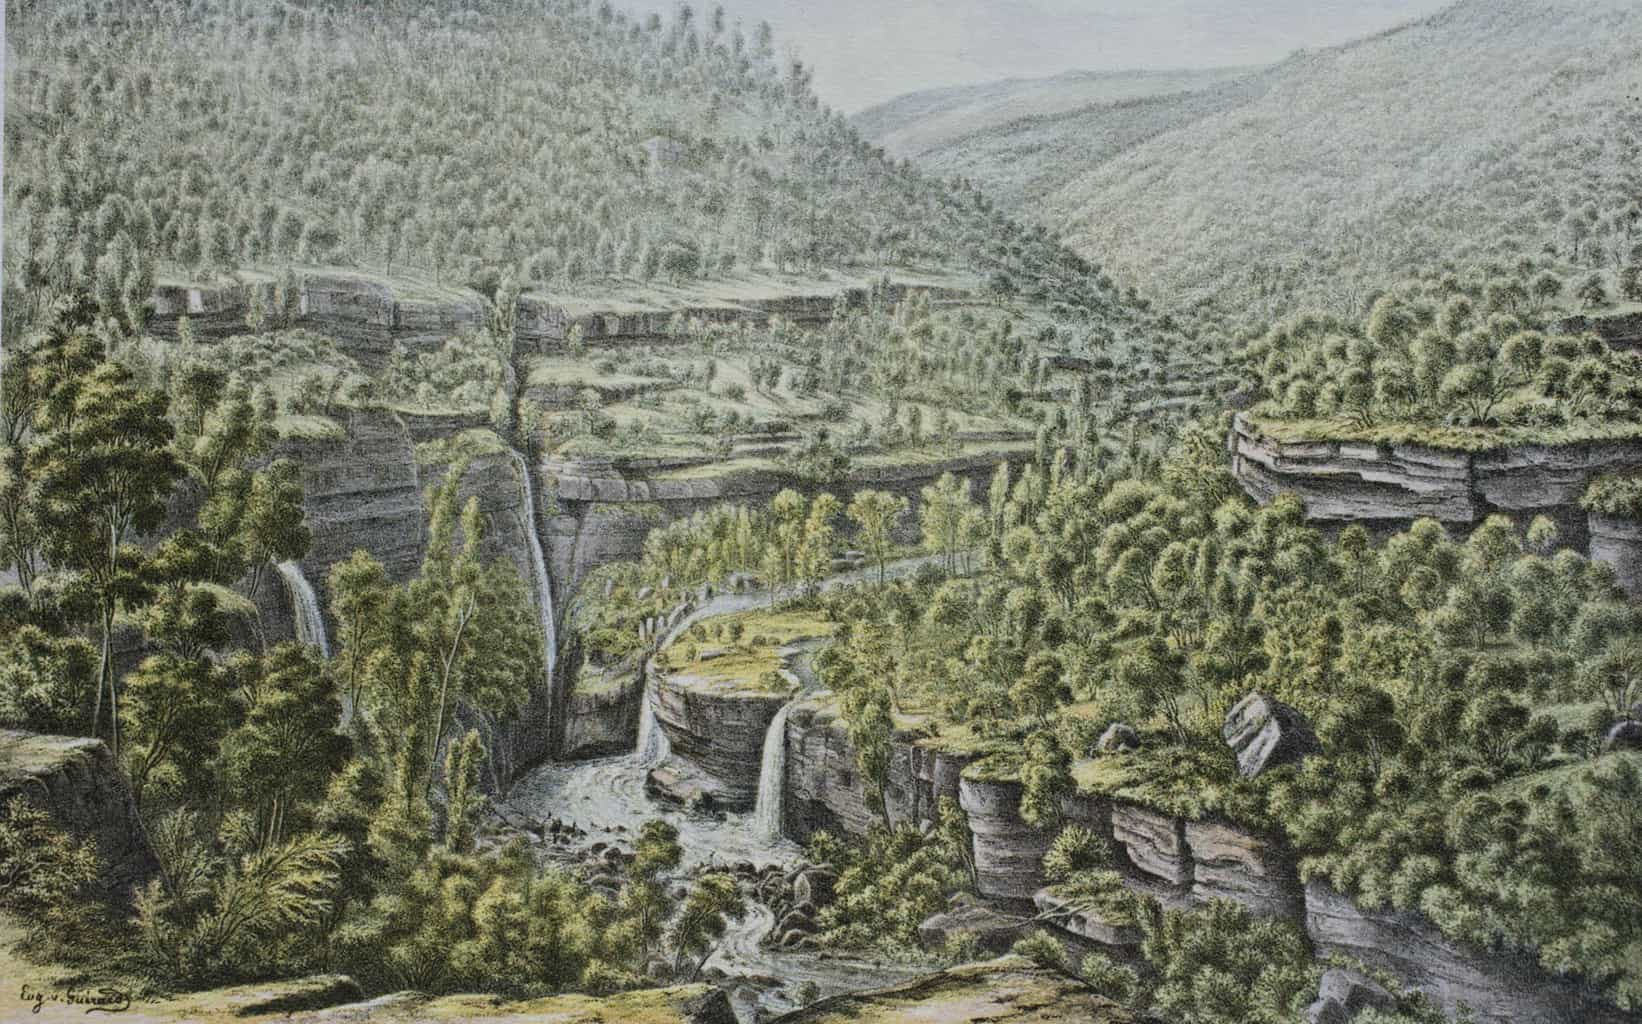 Moroka Gorge Falls: